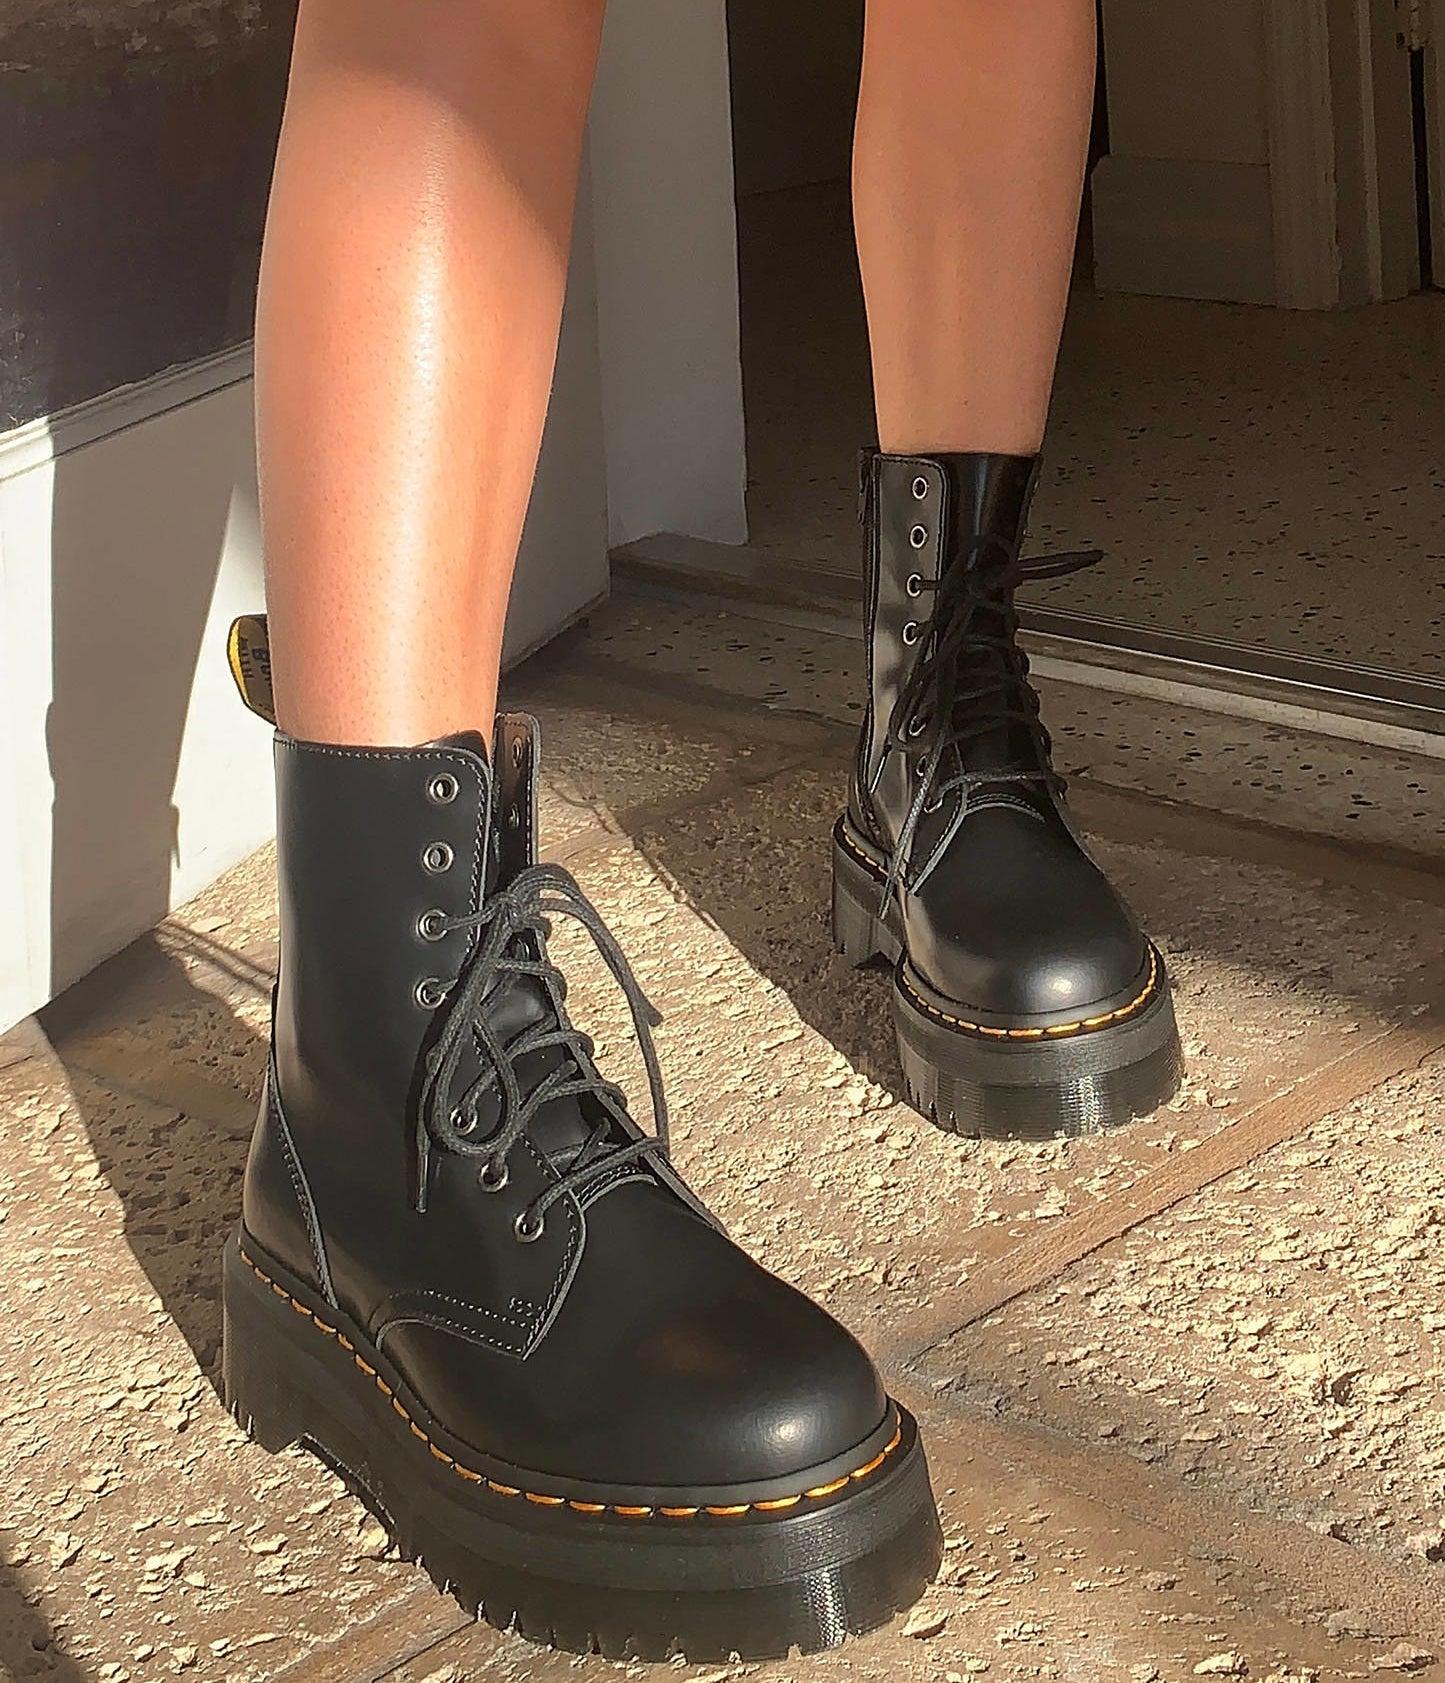 a person wearing a pair of dr. marten platform boots